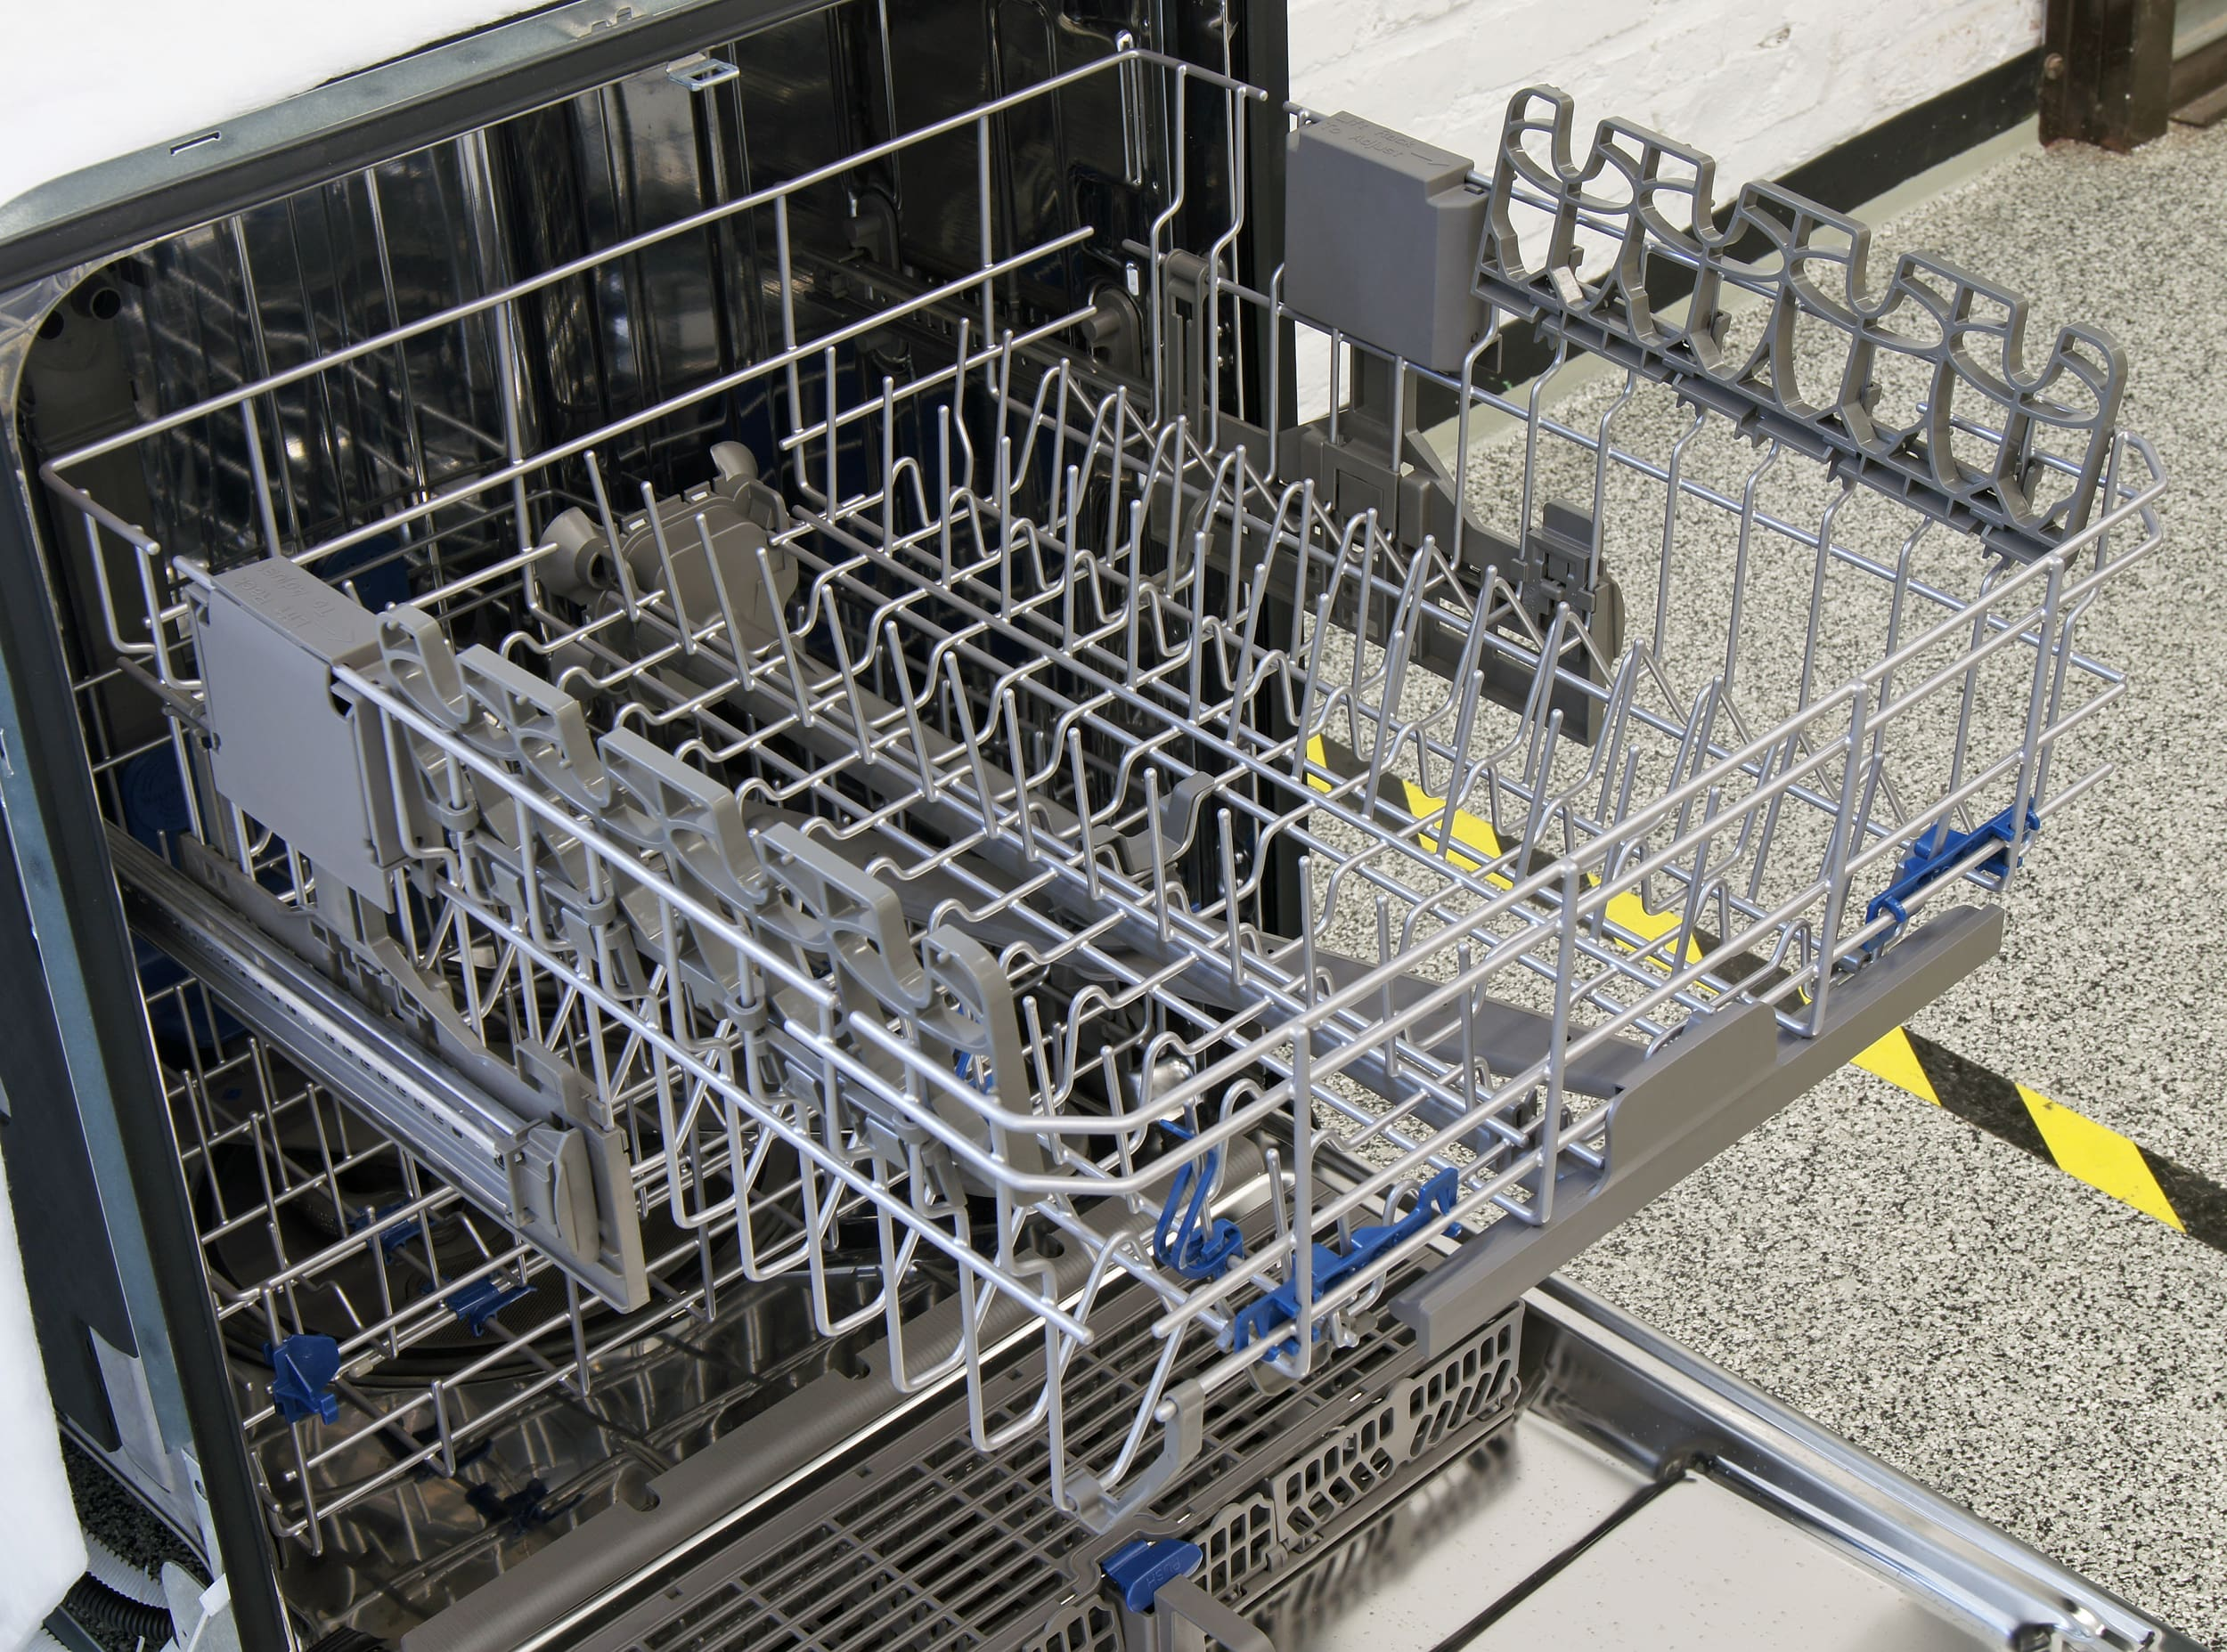 Whirlpool WDT920SADM top rack